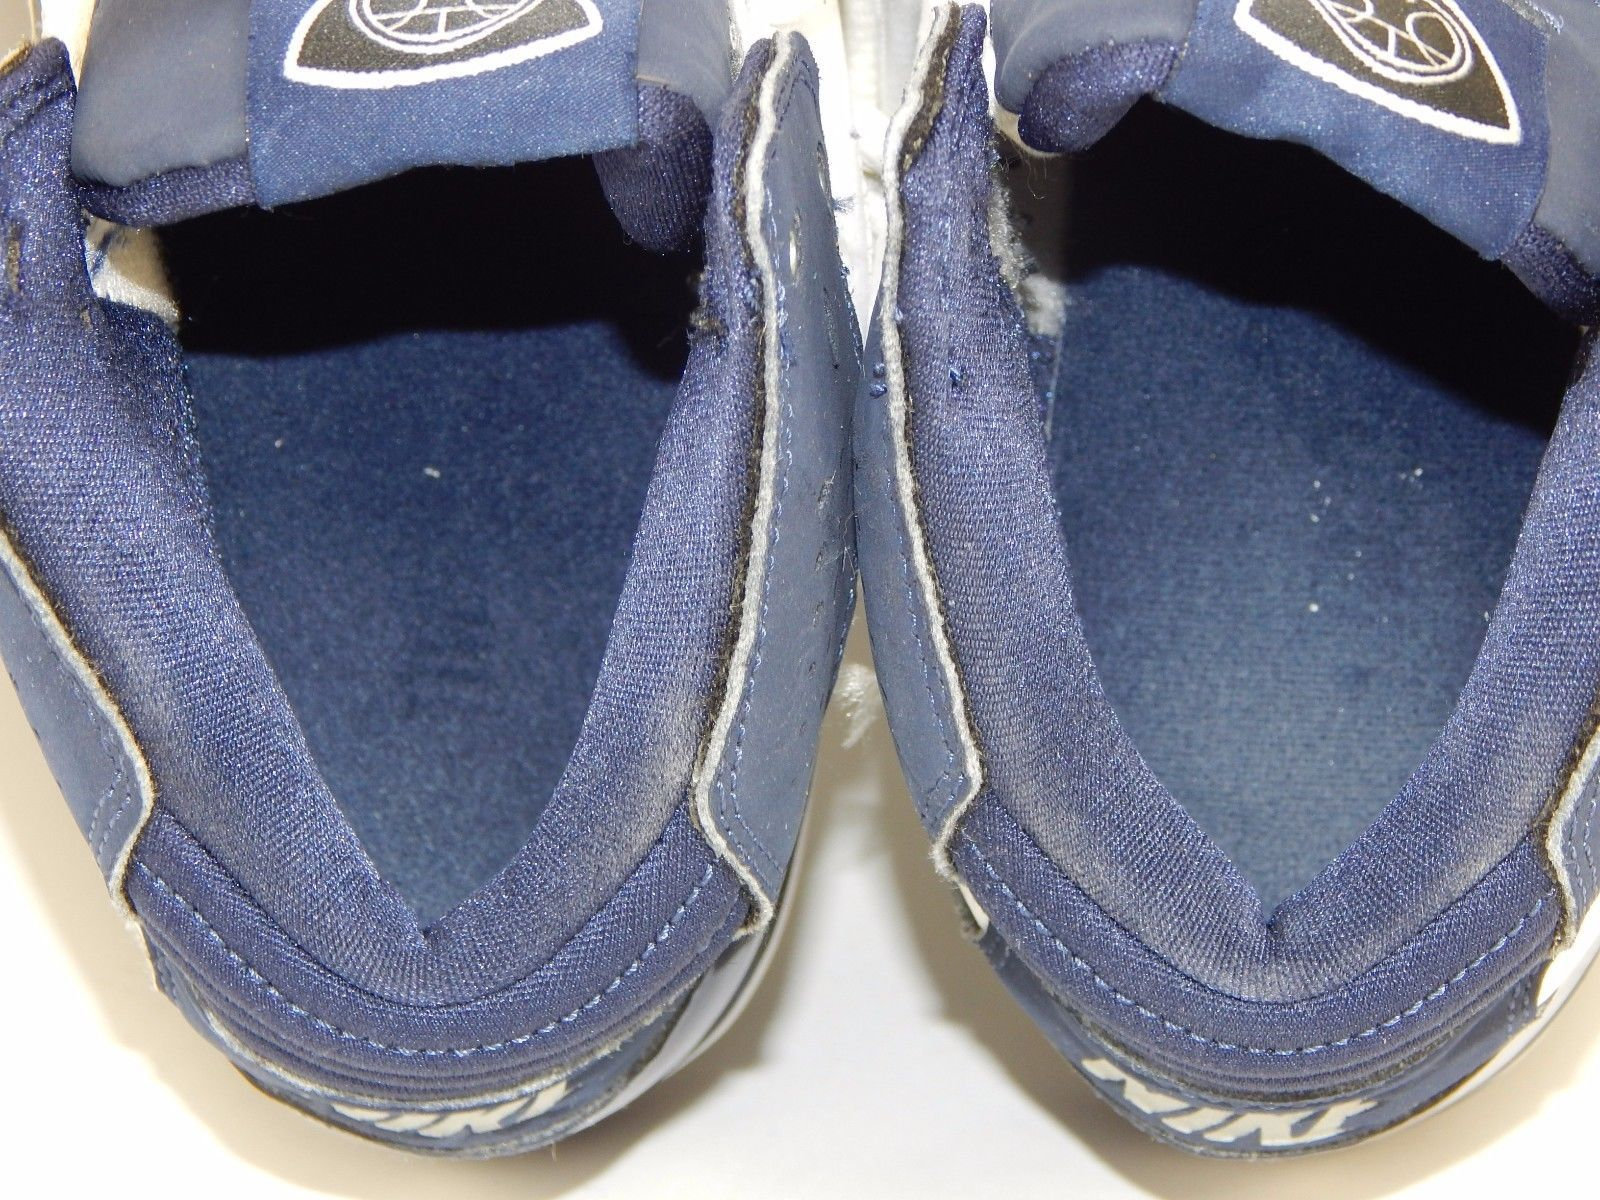 Nike Temptation Men's Basketball Shoes Size US 9 M (D) EU 42.5 White 366809-141